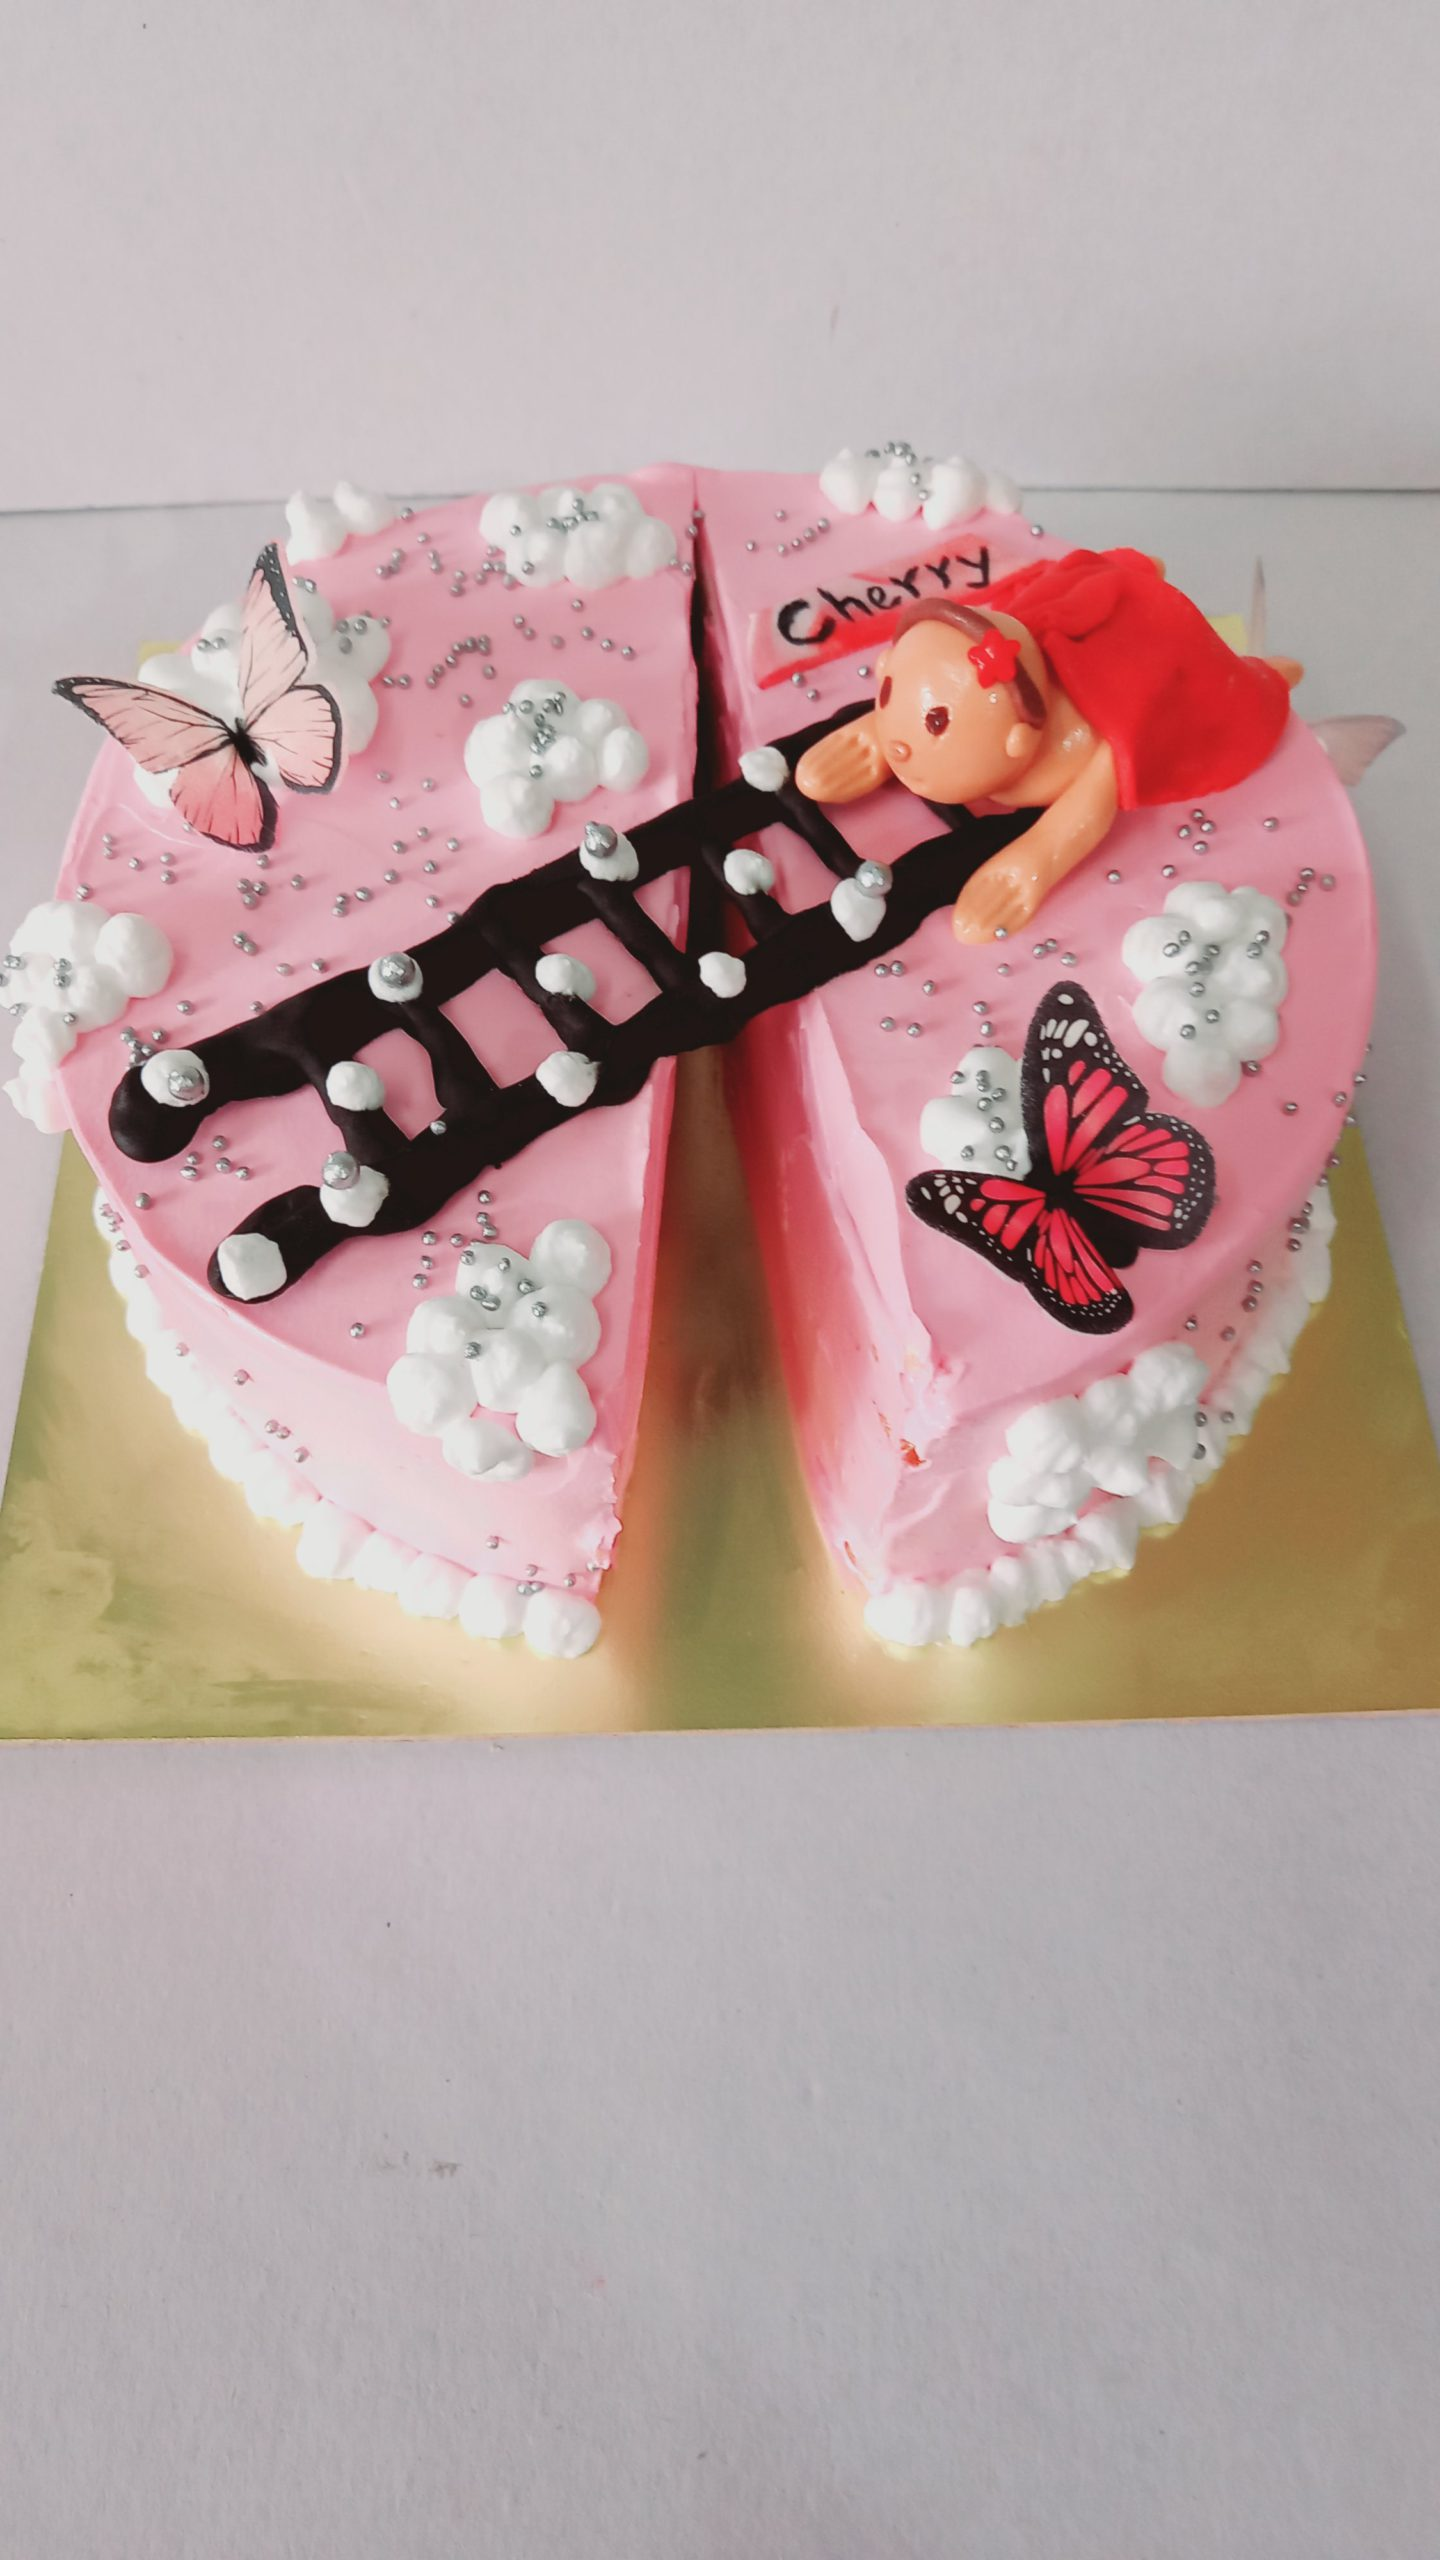 Half Way To One Theme Cake Designs, Images, Price Near Me